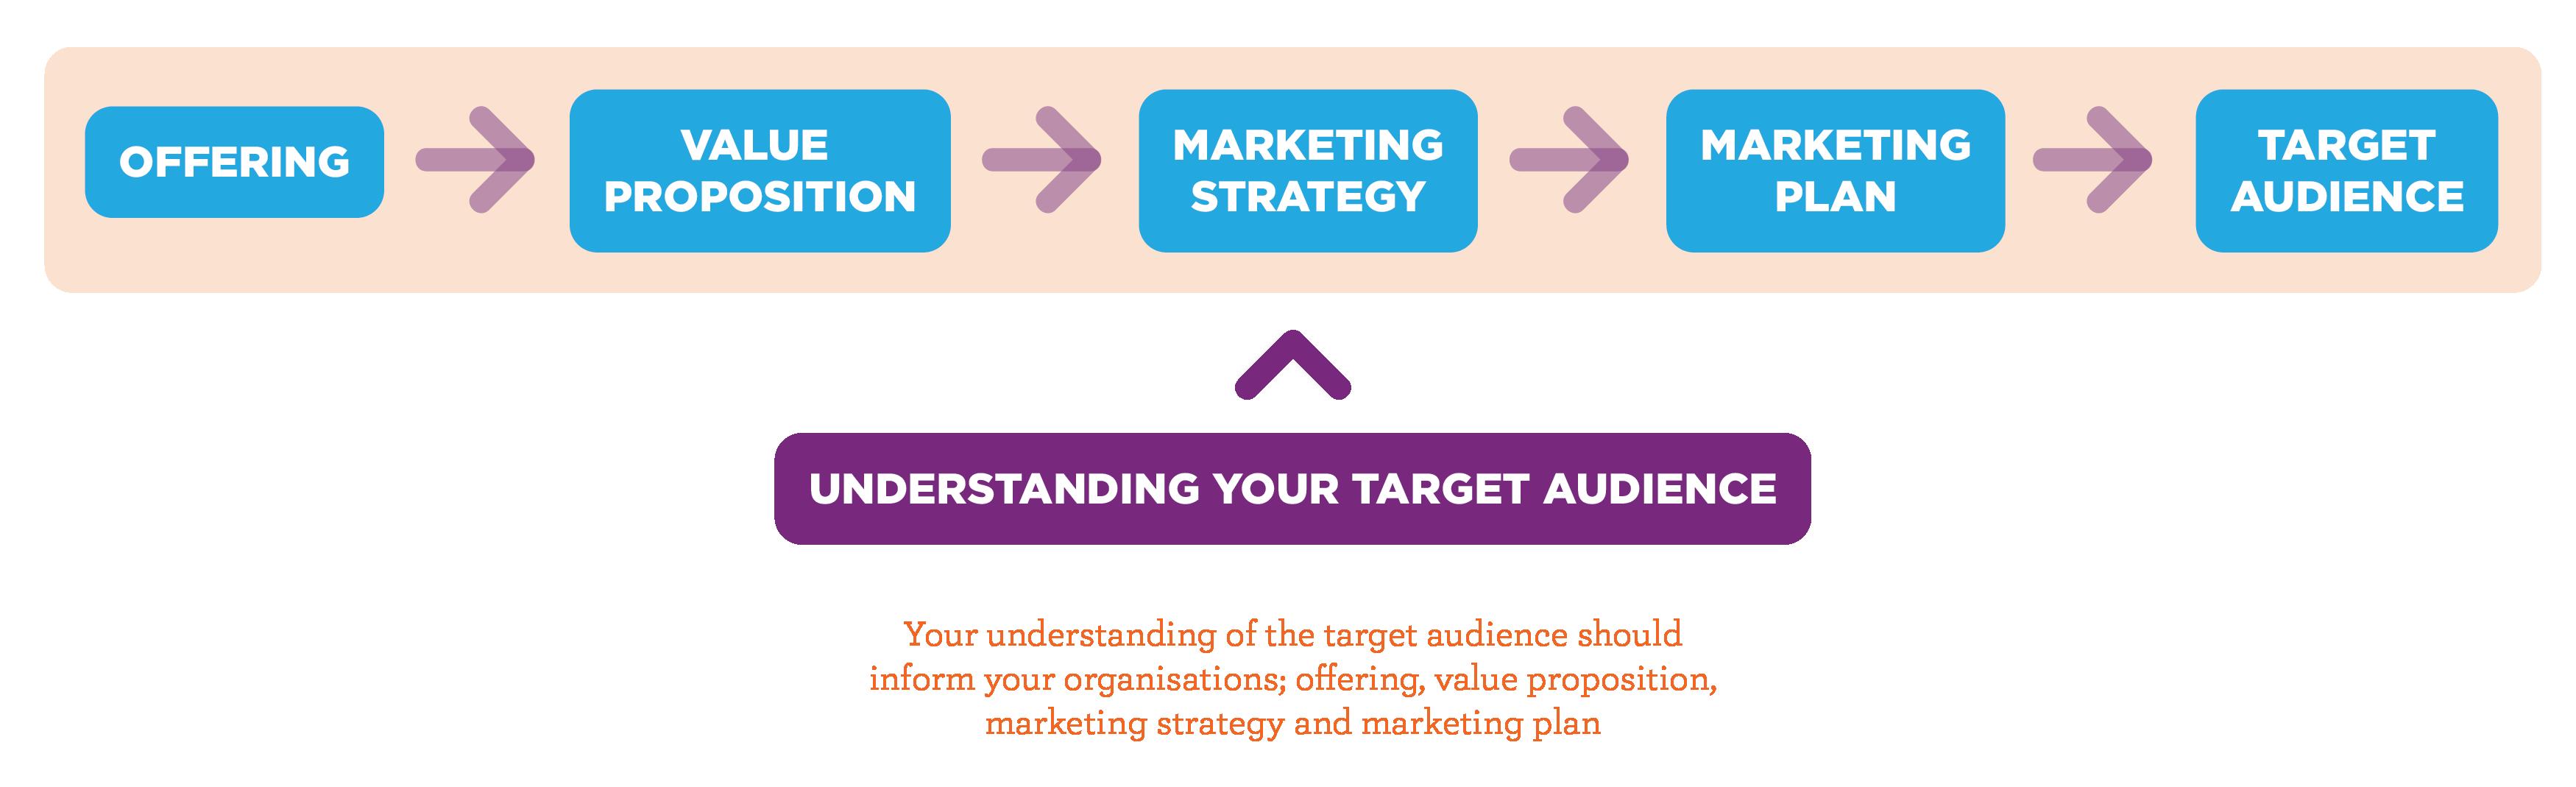 Unltd Understanding Your Target Audience Value Proposition